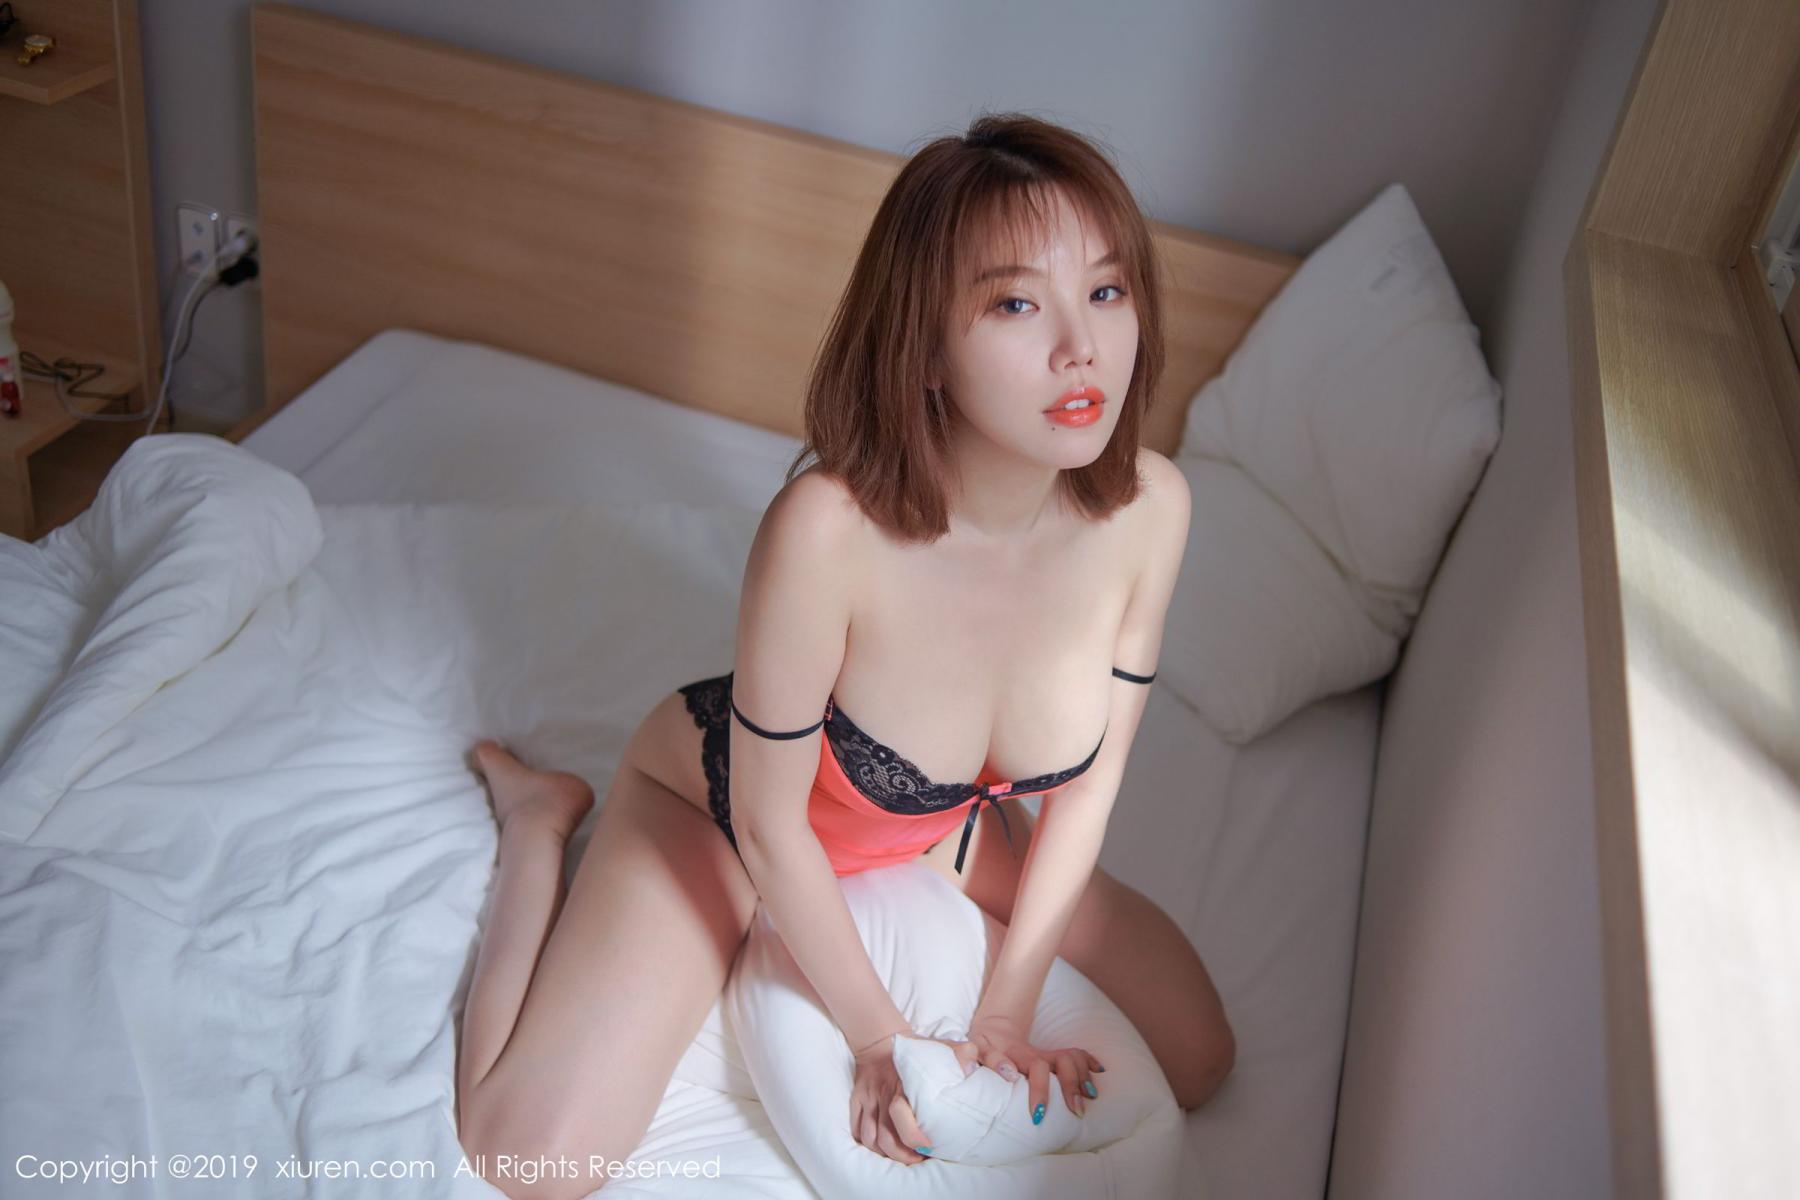 [XiuRen] Vol.1684 Huang Le Ran 39P, Huang Le Ran, Underwear, Xiuren